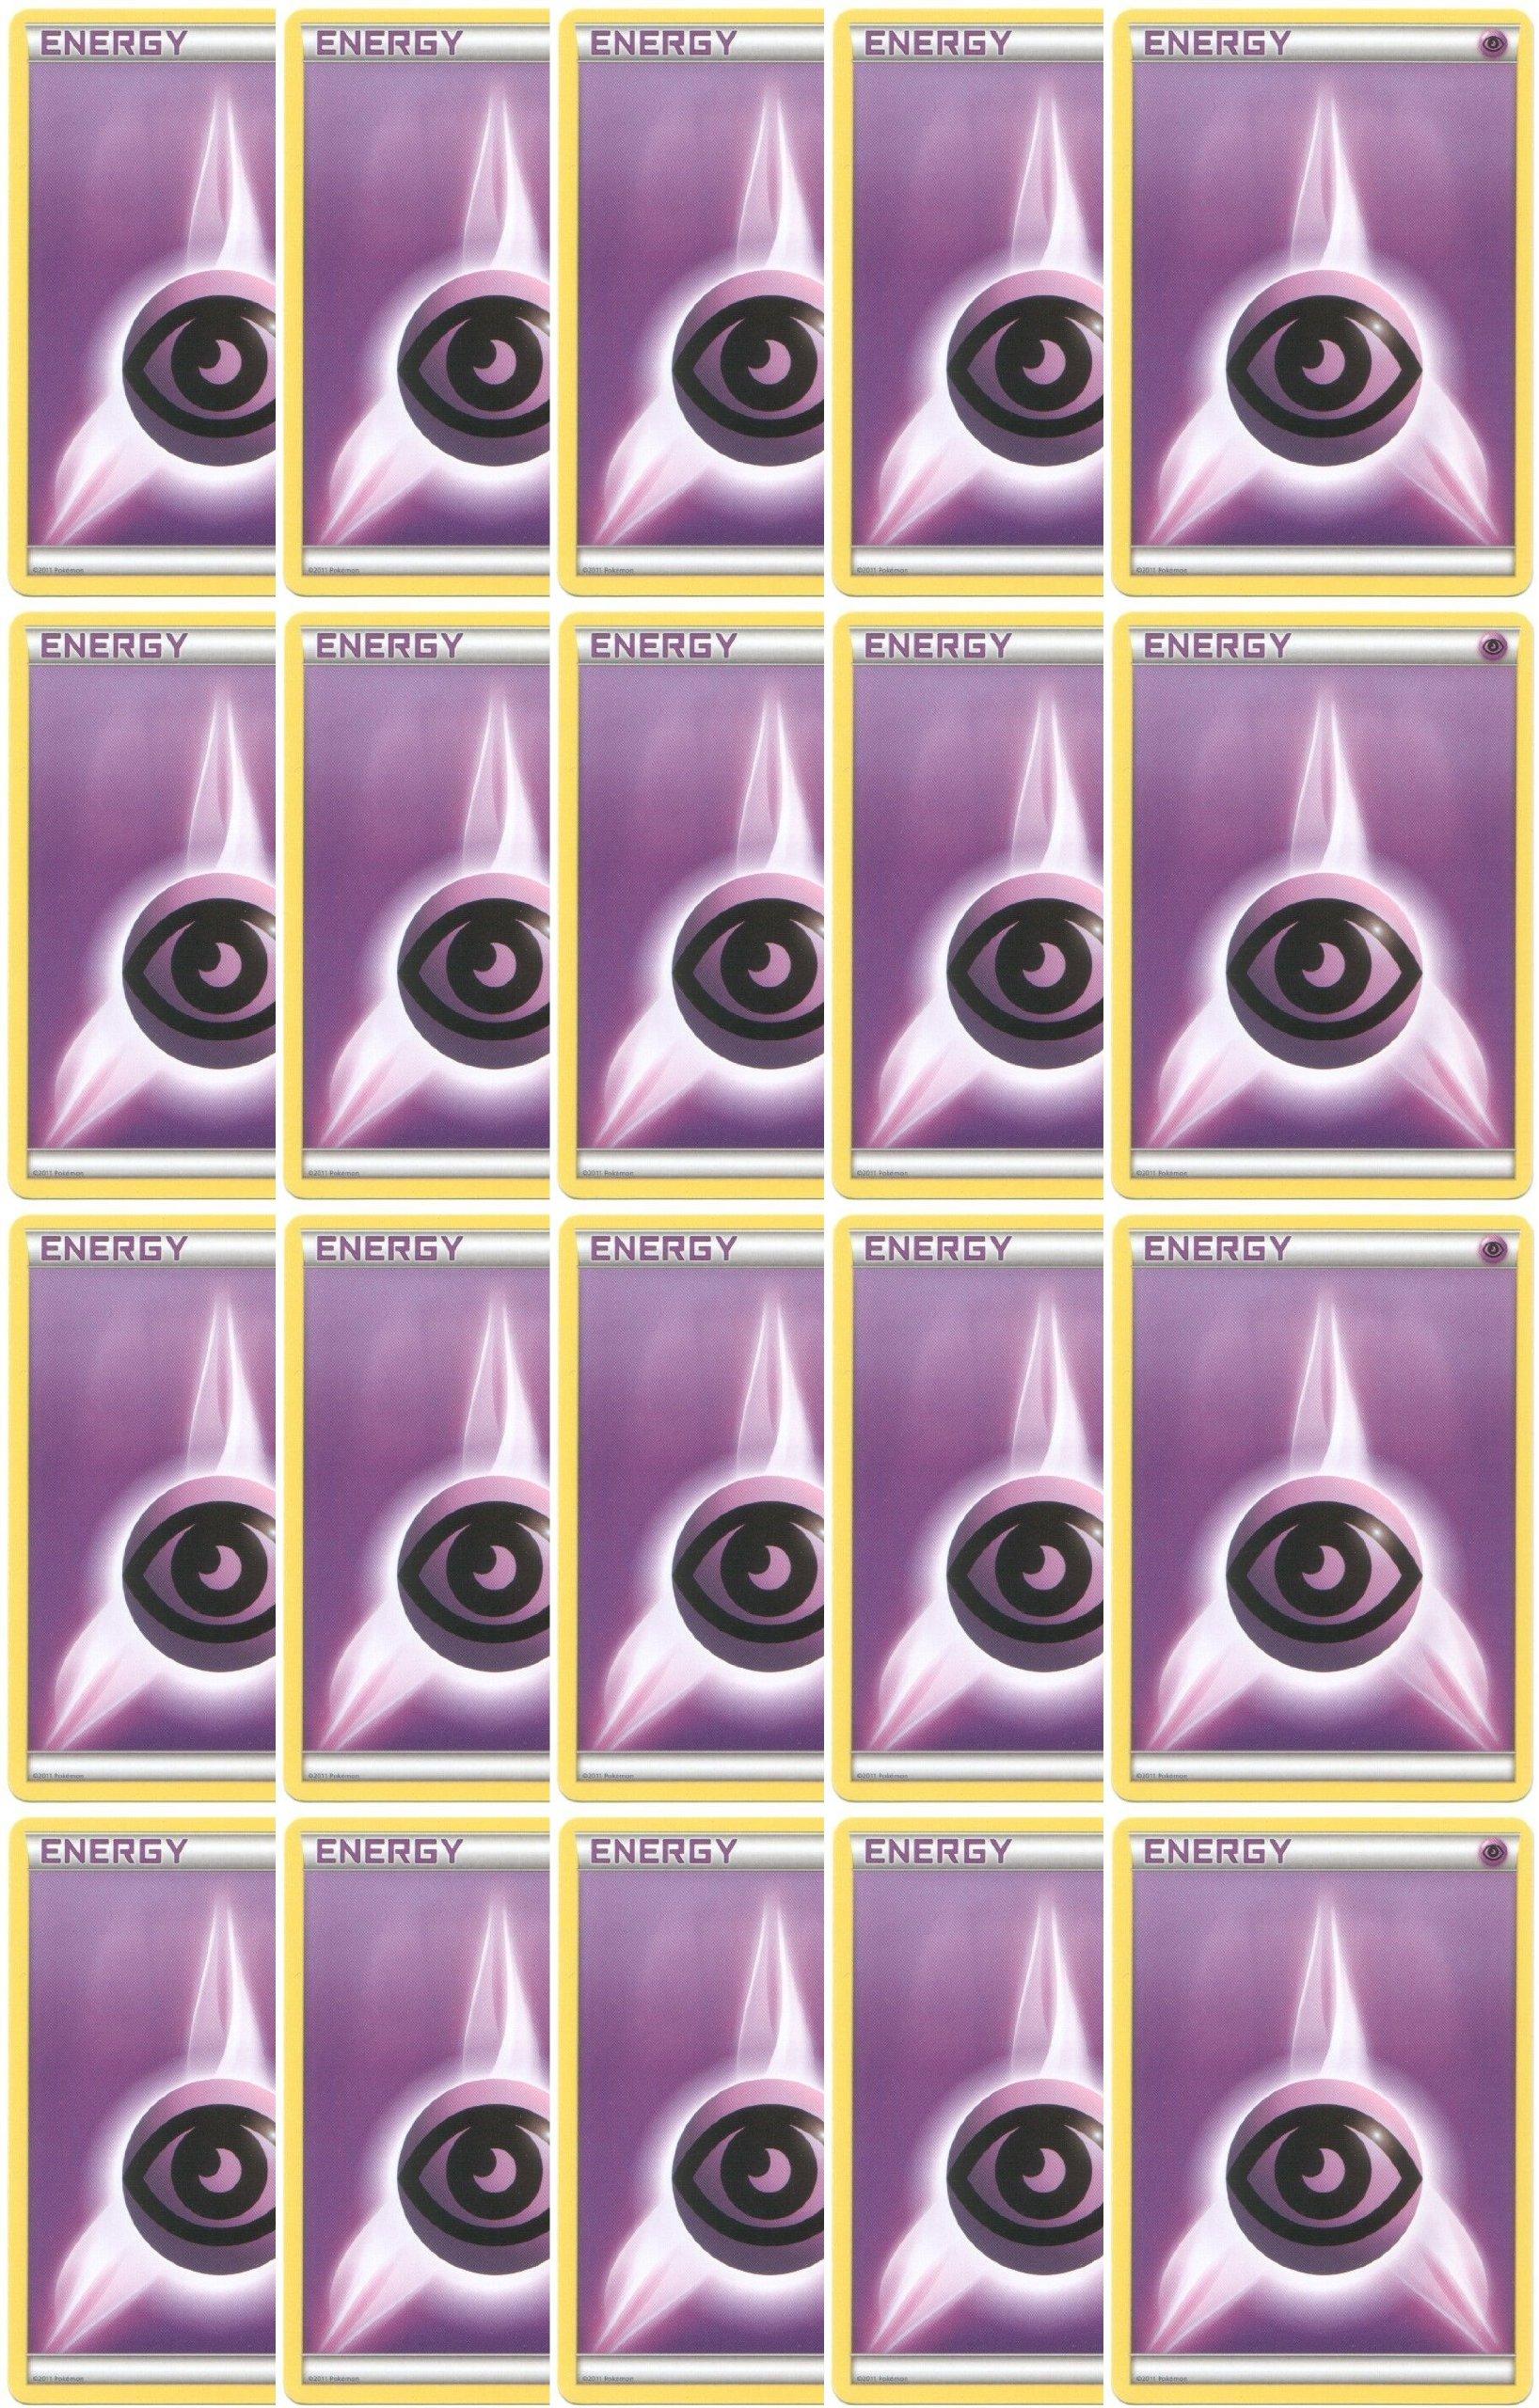 20 Basic Psychic Energy Pokemon Cards (XY/Black and White Series Design, Unnumbered) [Purple-Type]